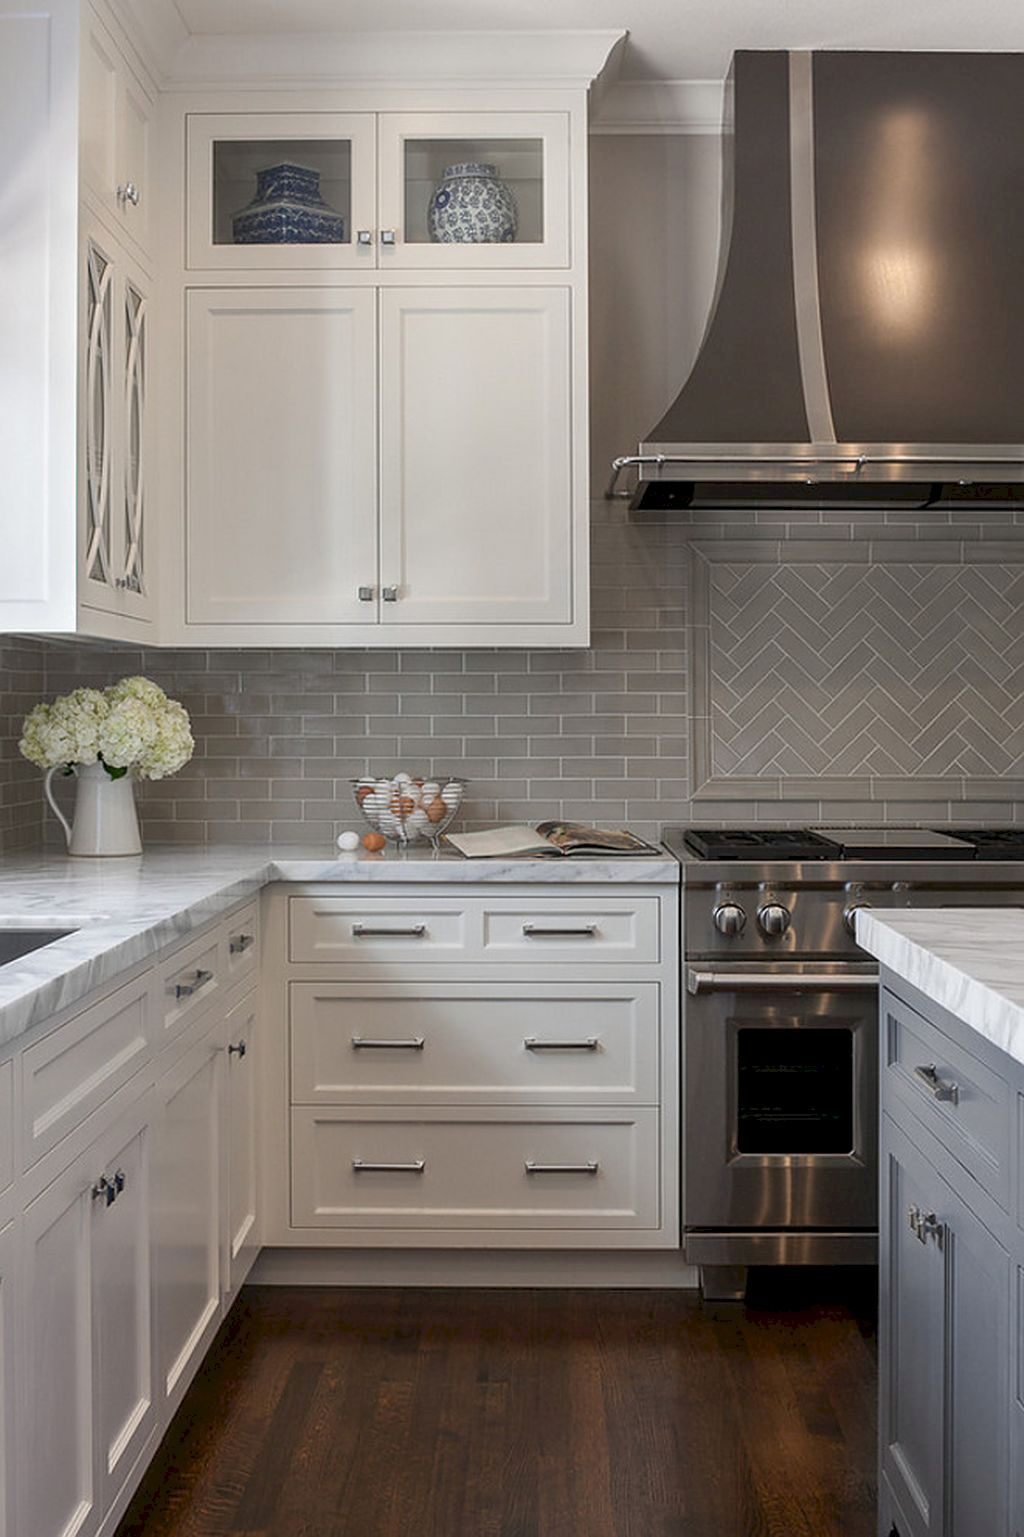 Awesome kitchen backsplash design and décor ideas decorating